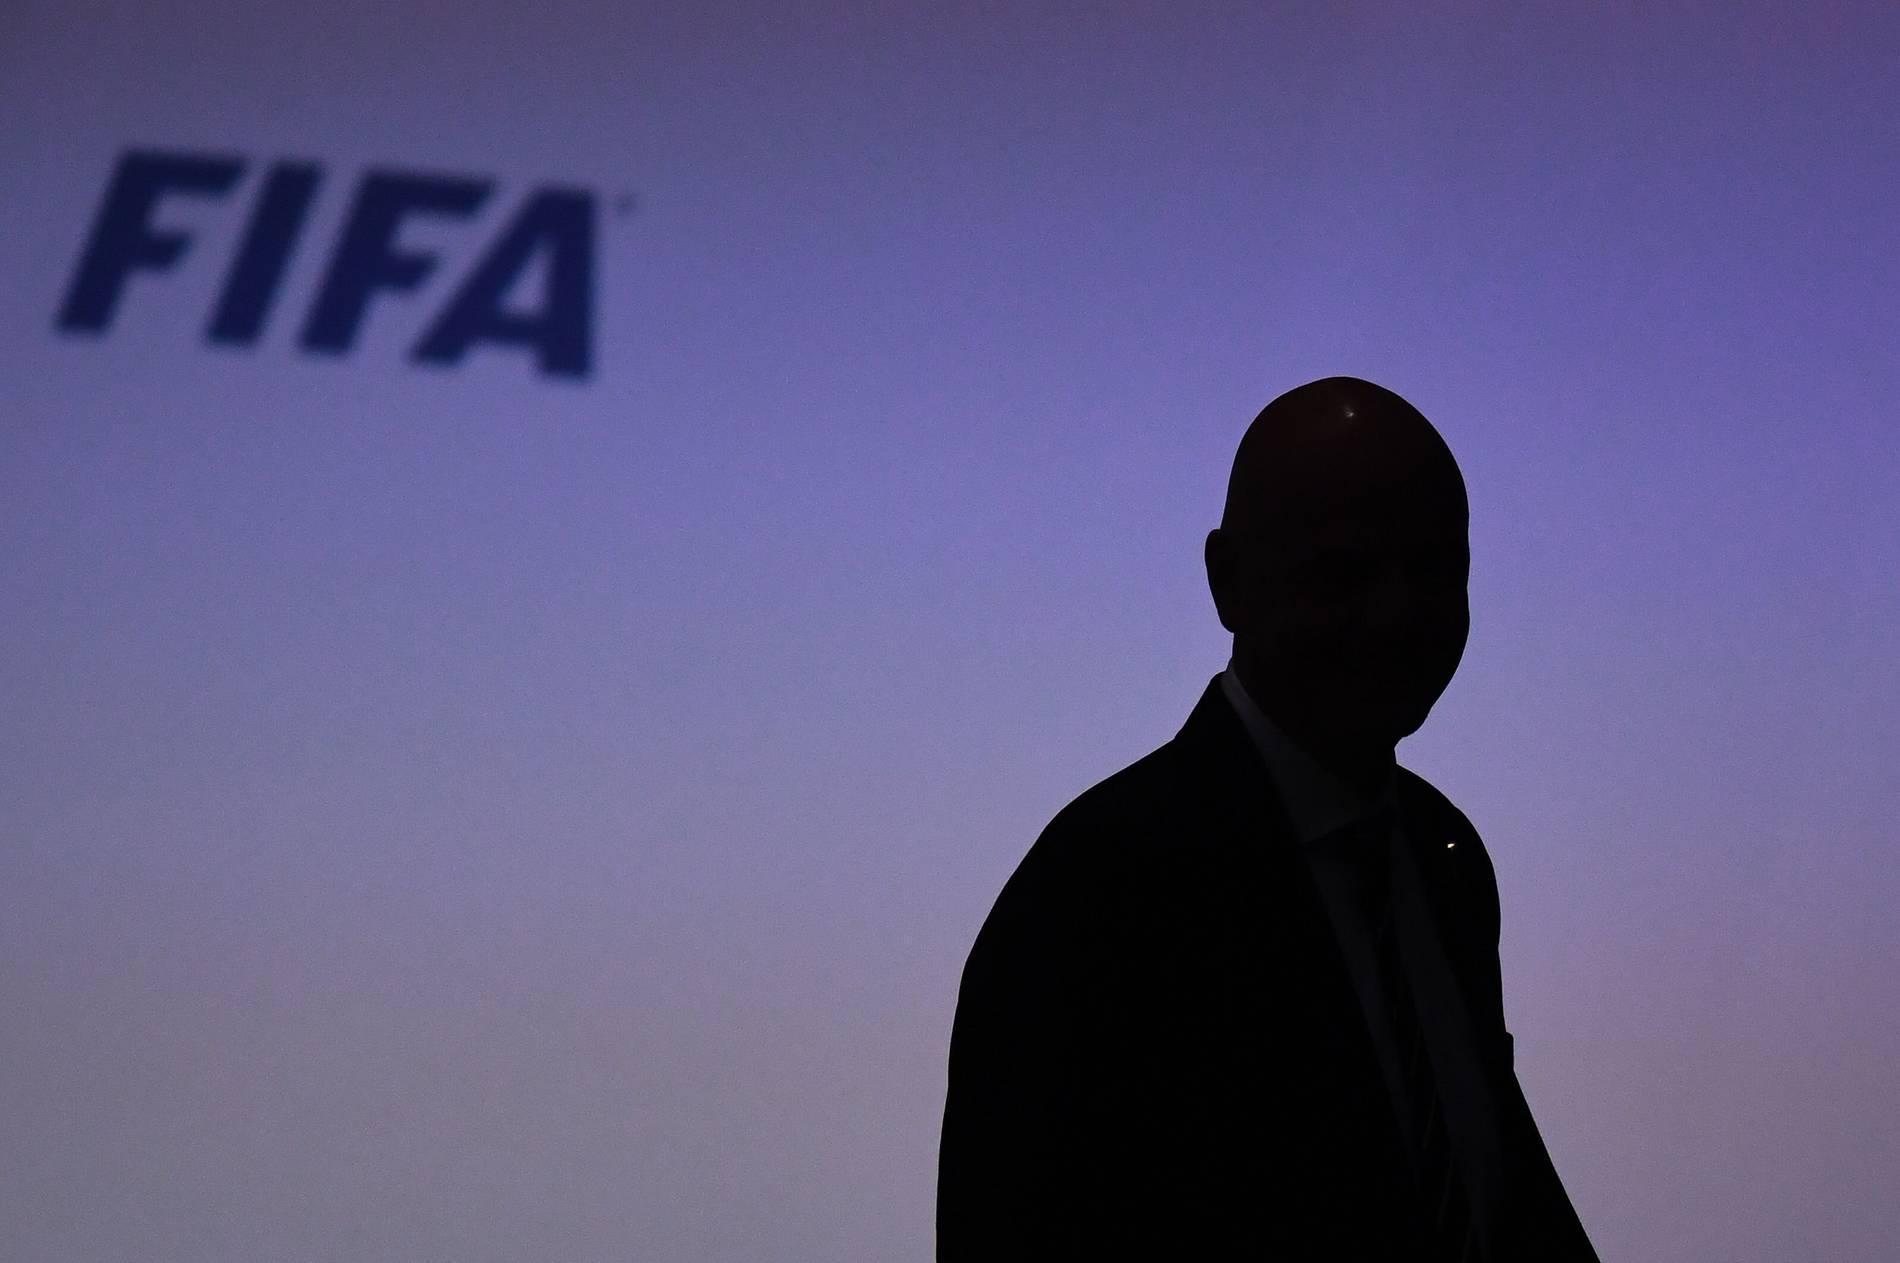 Fussball Wm 2022 Fifa Raumt Erstmals Verstosse Bei